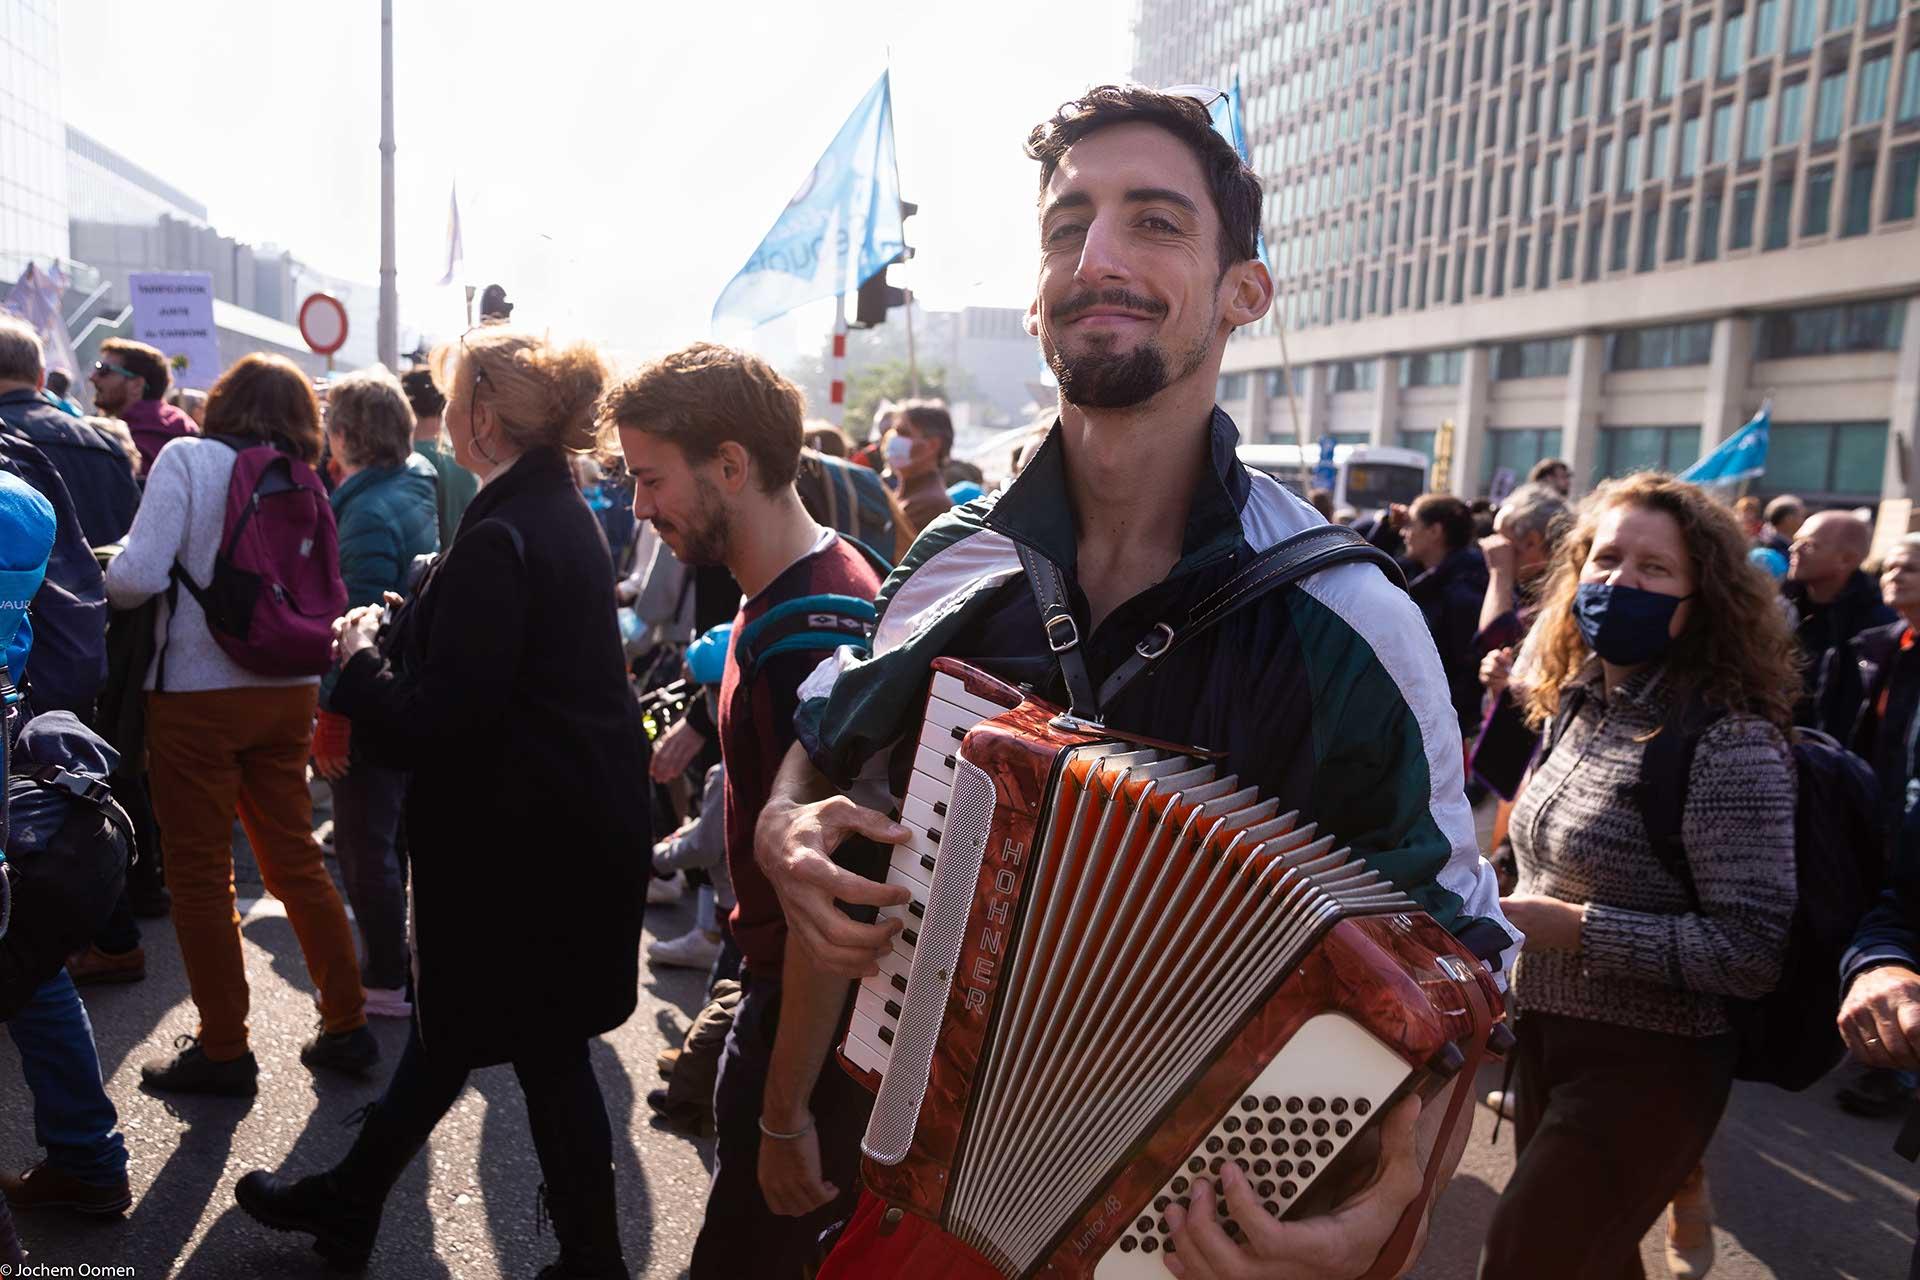 Back To The Climate (photo: Jochem Oomen)